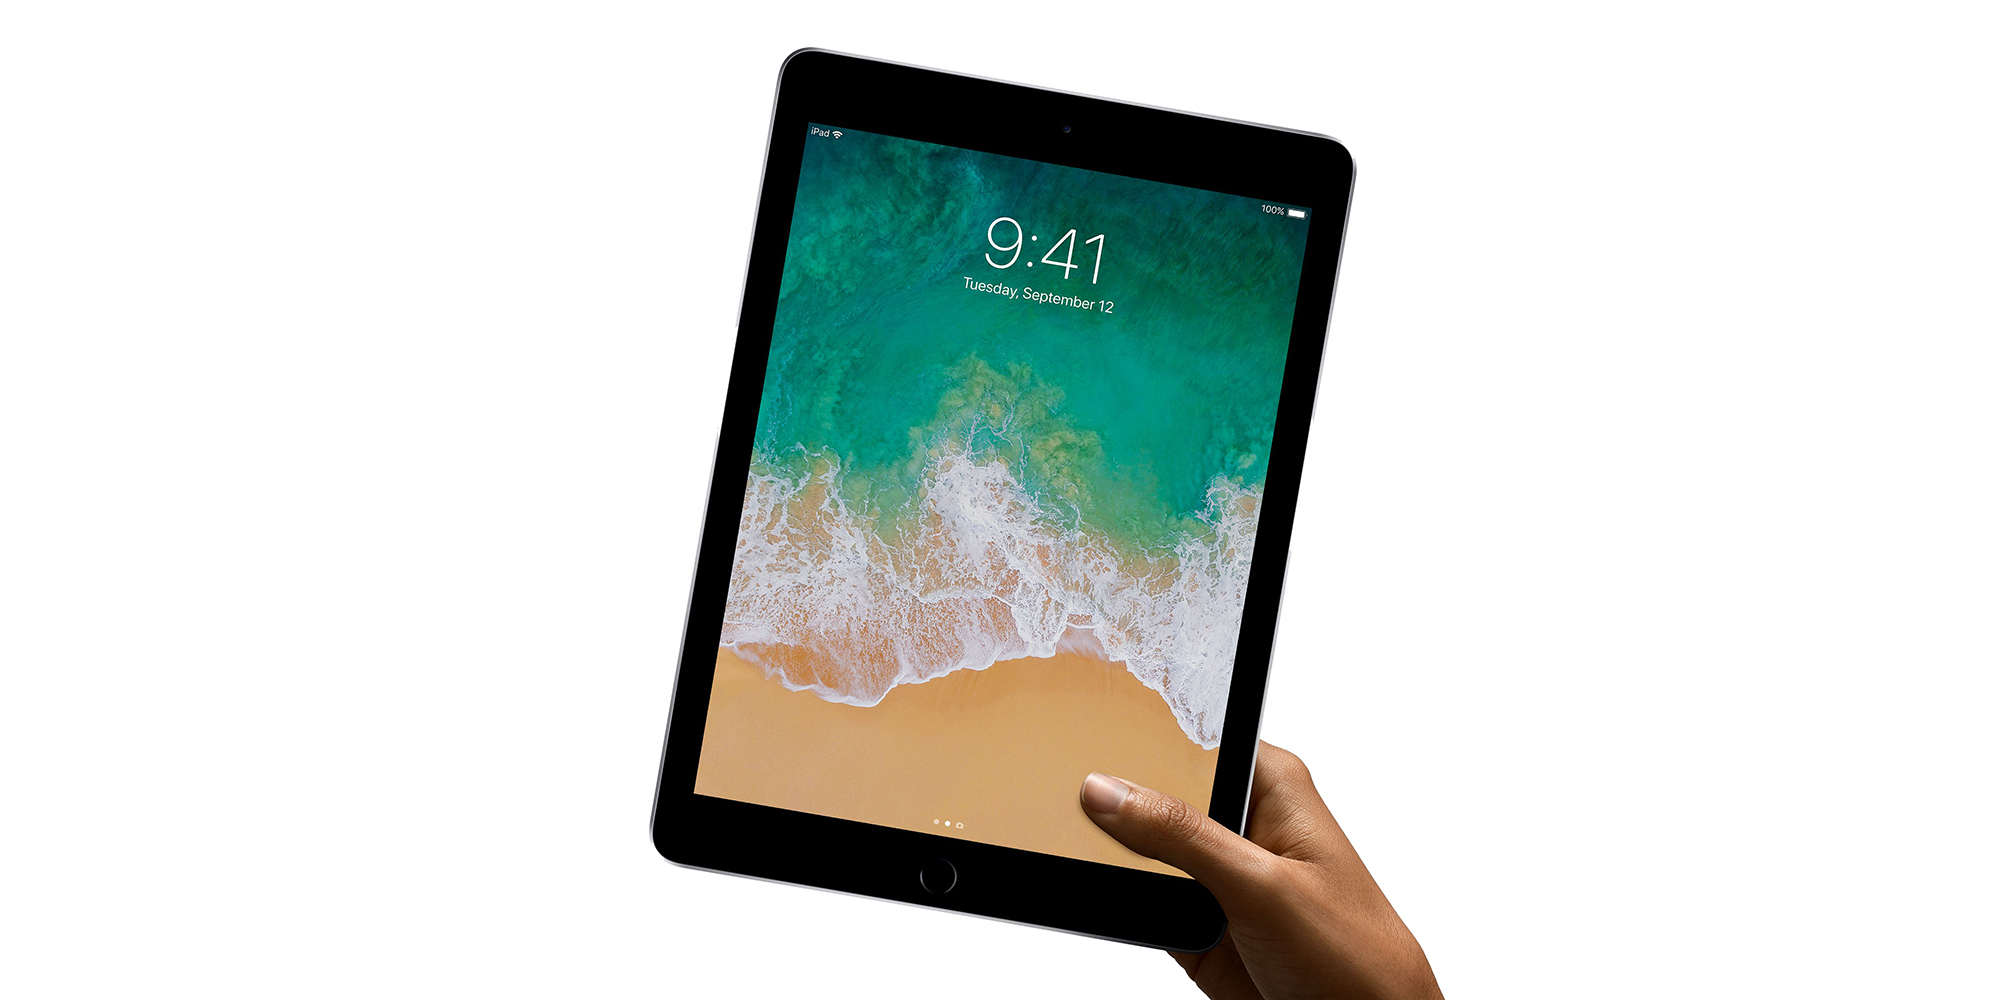 Apple's previous-generation 9.7-inch iPad Wi-Fi 128GB: $329 (Orig. $429)